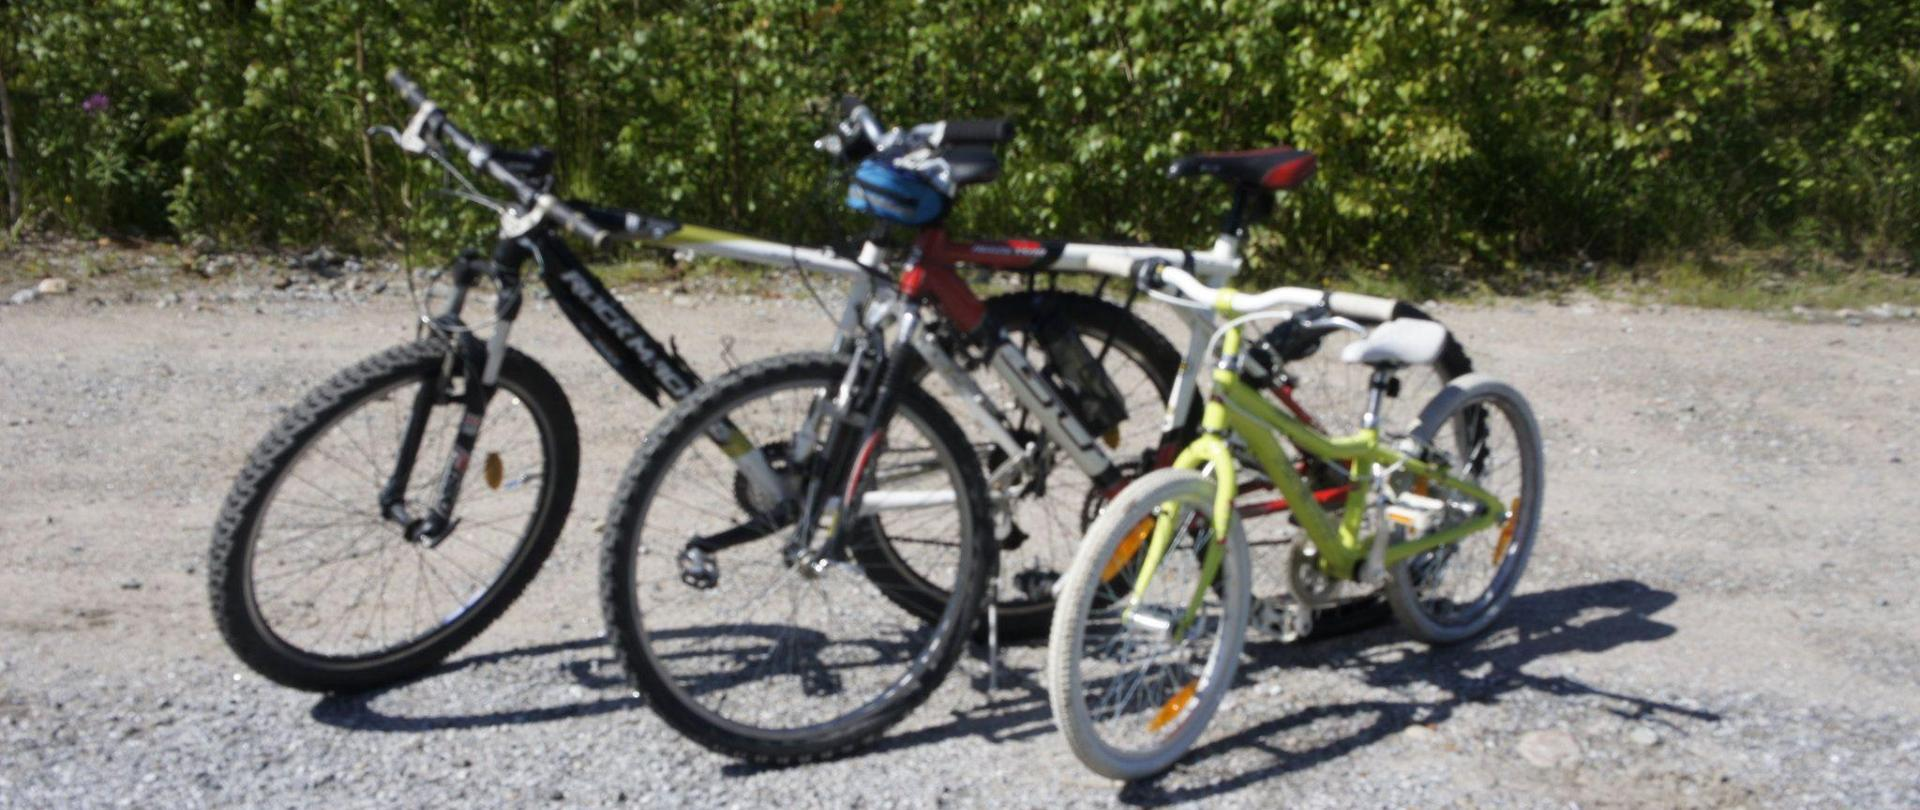 bikes-4.JPG